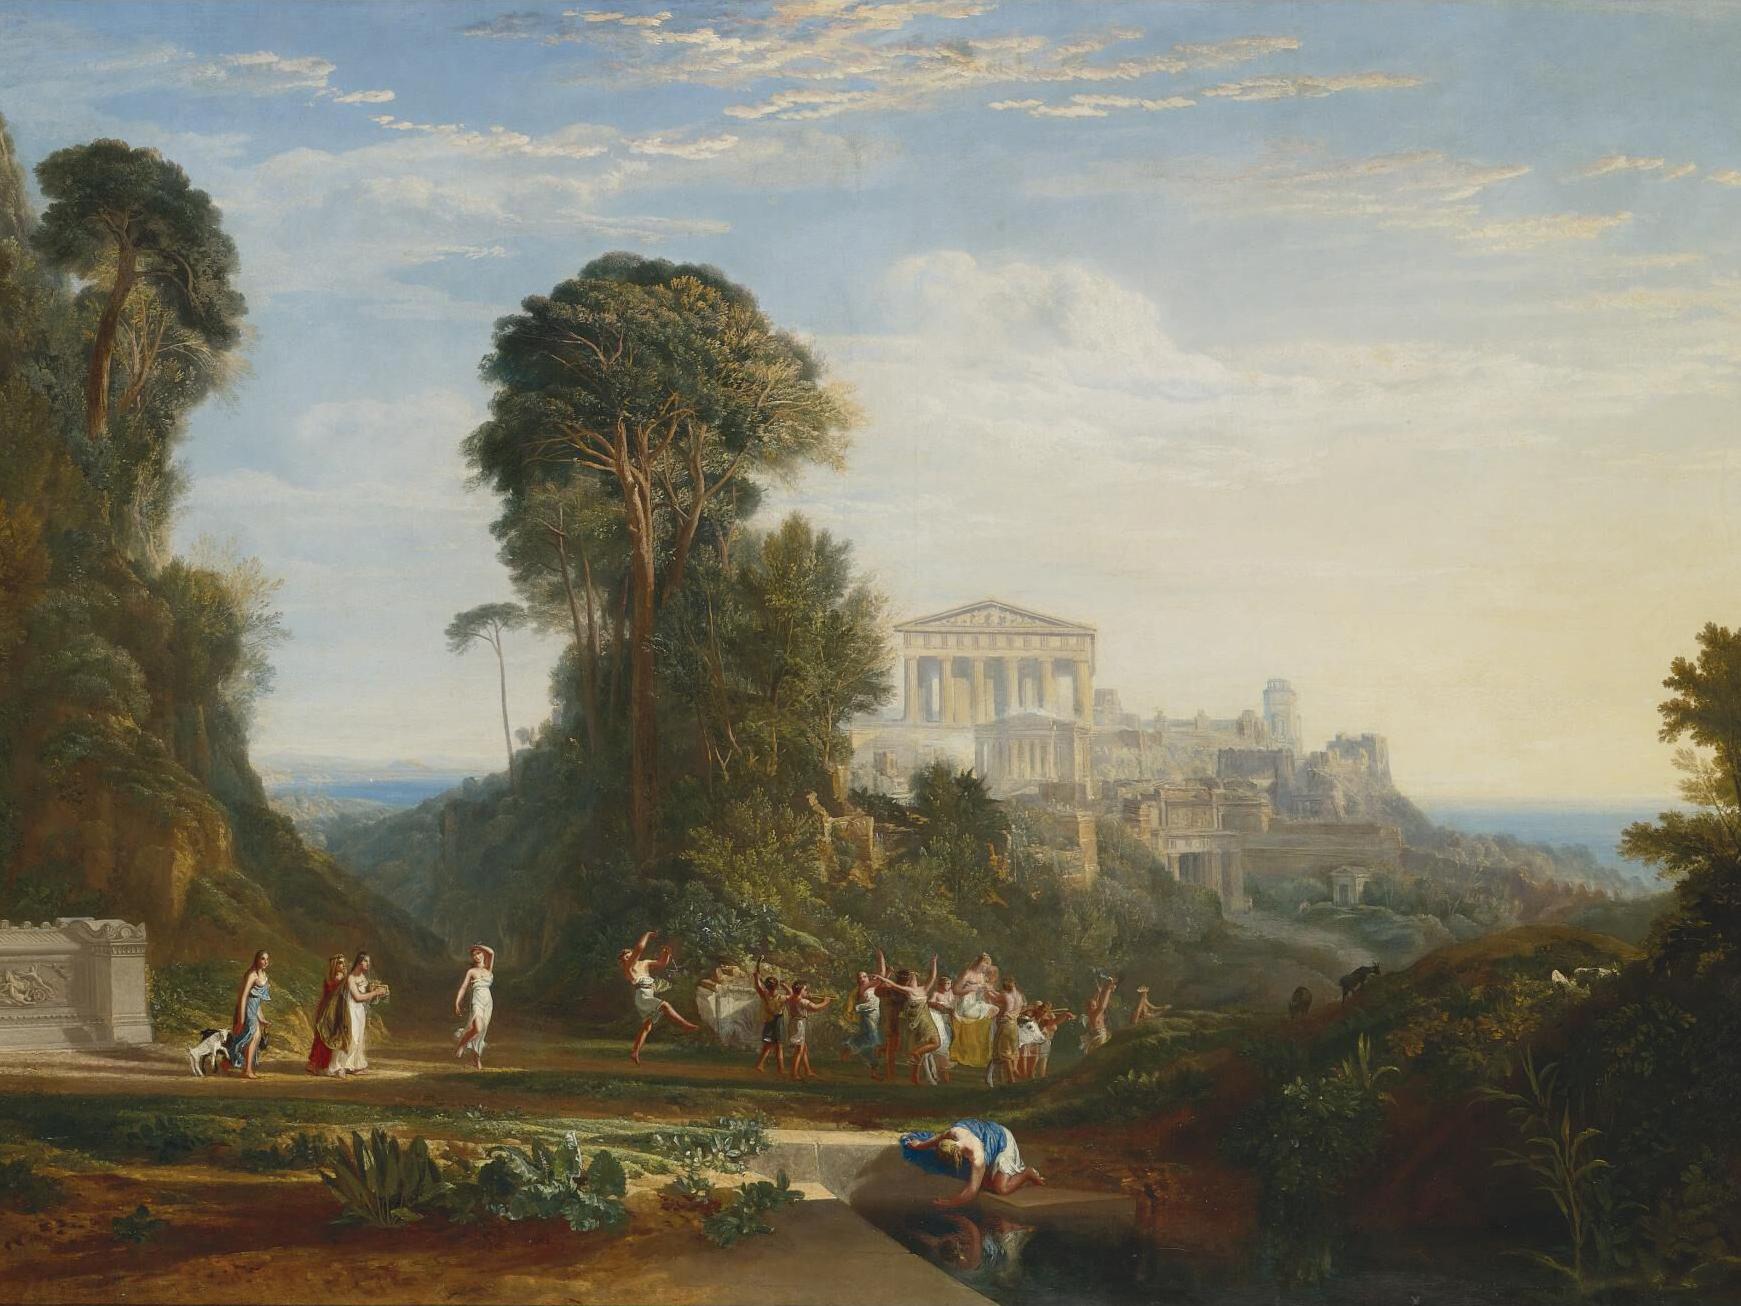 Joseph Mallord William Turner, The Temple of Jupiter